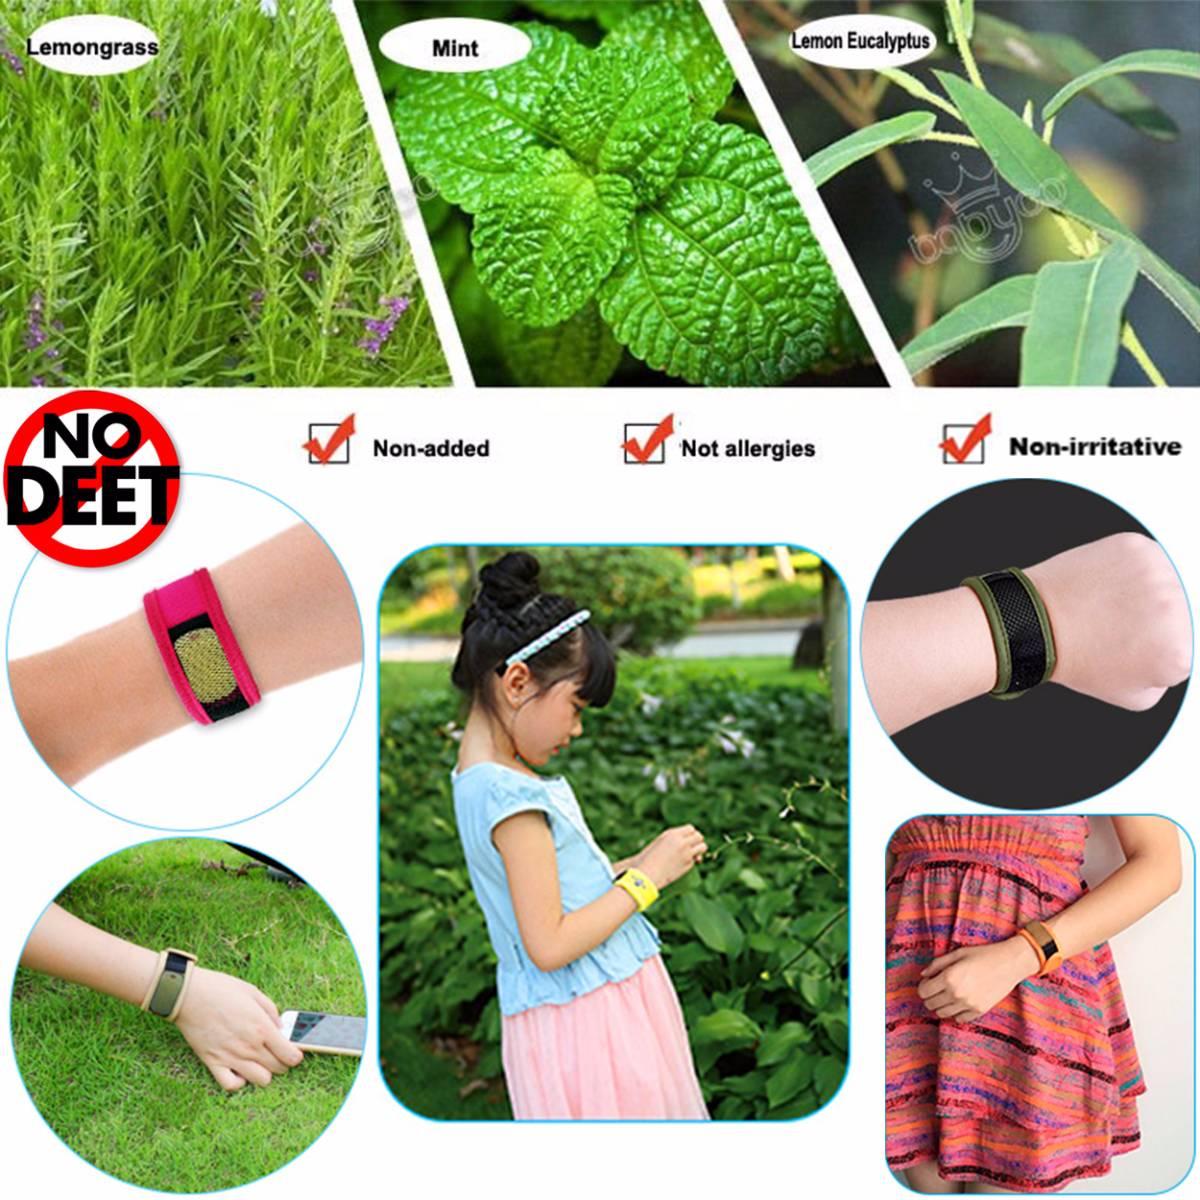 Babygo Neoprene Mosquito Repellent Wristband Camouflage (gelang Anti Nyamuk)2